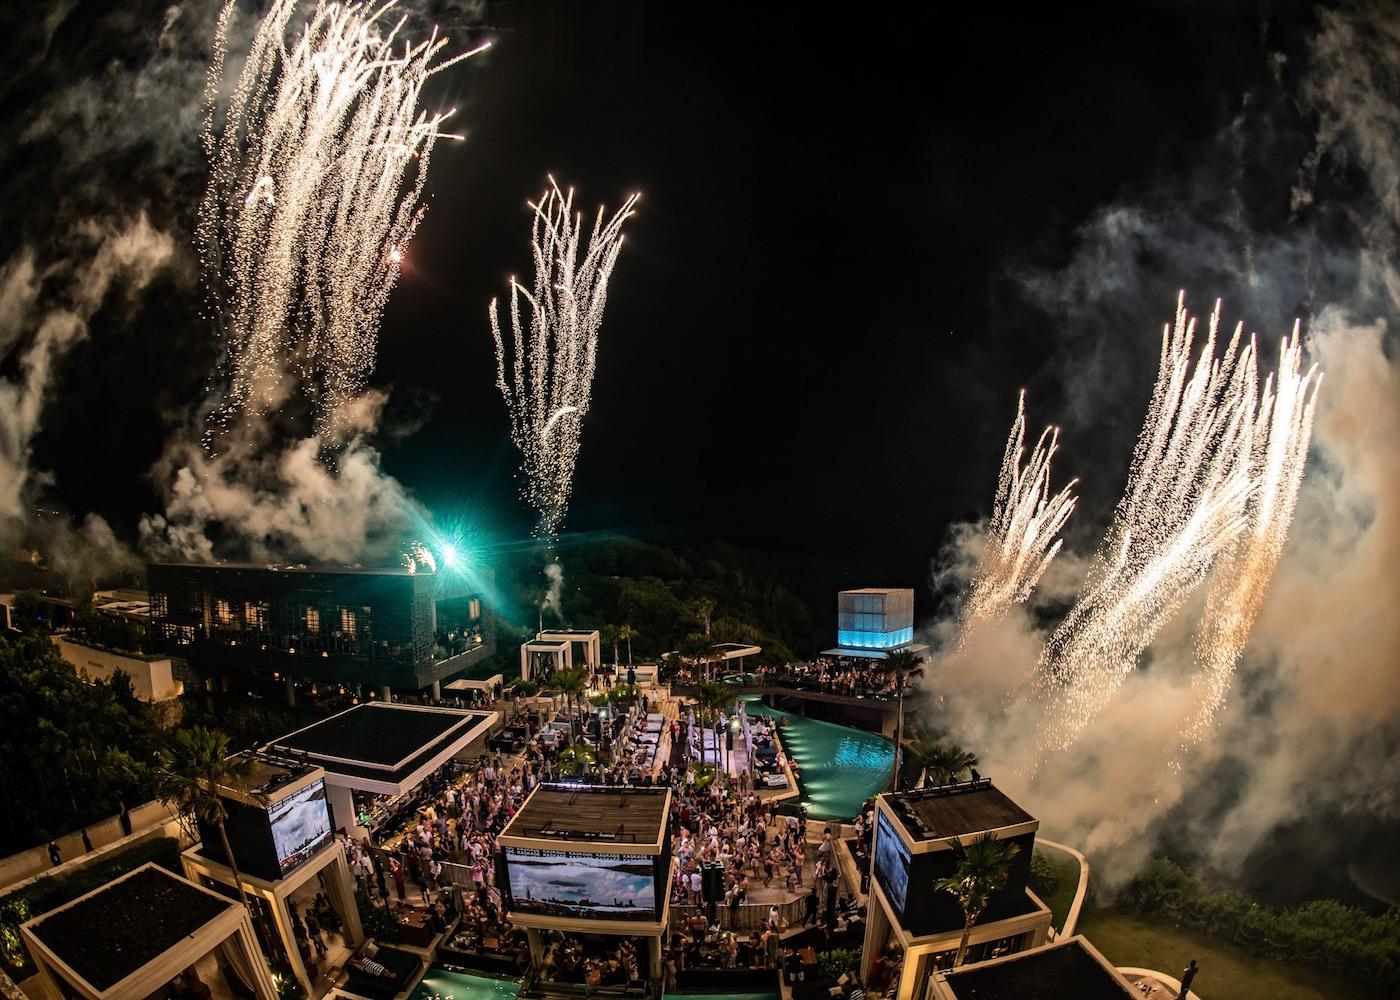 New Year's Eve Party at OMNIA Dayclub in Uluwatu, Bali, Indonesia